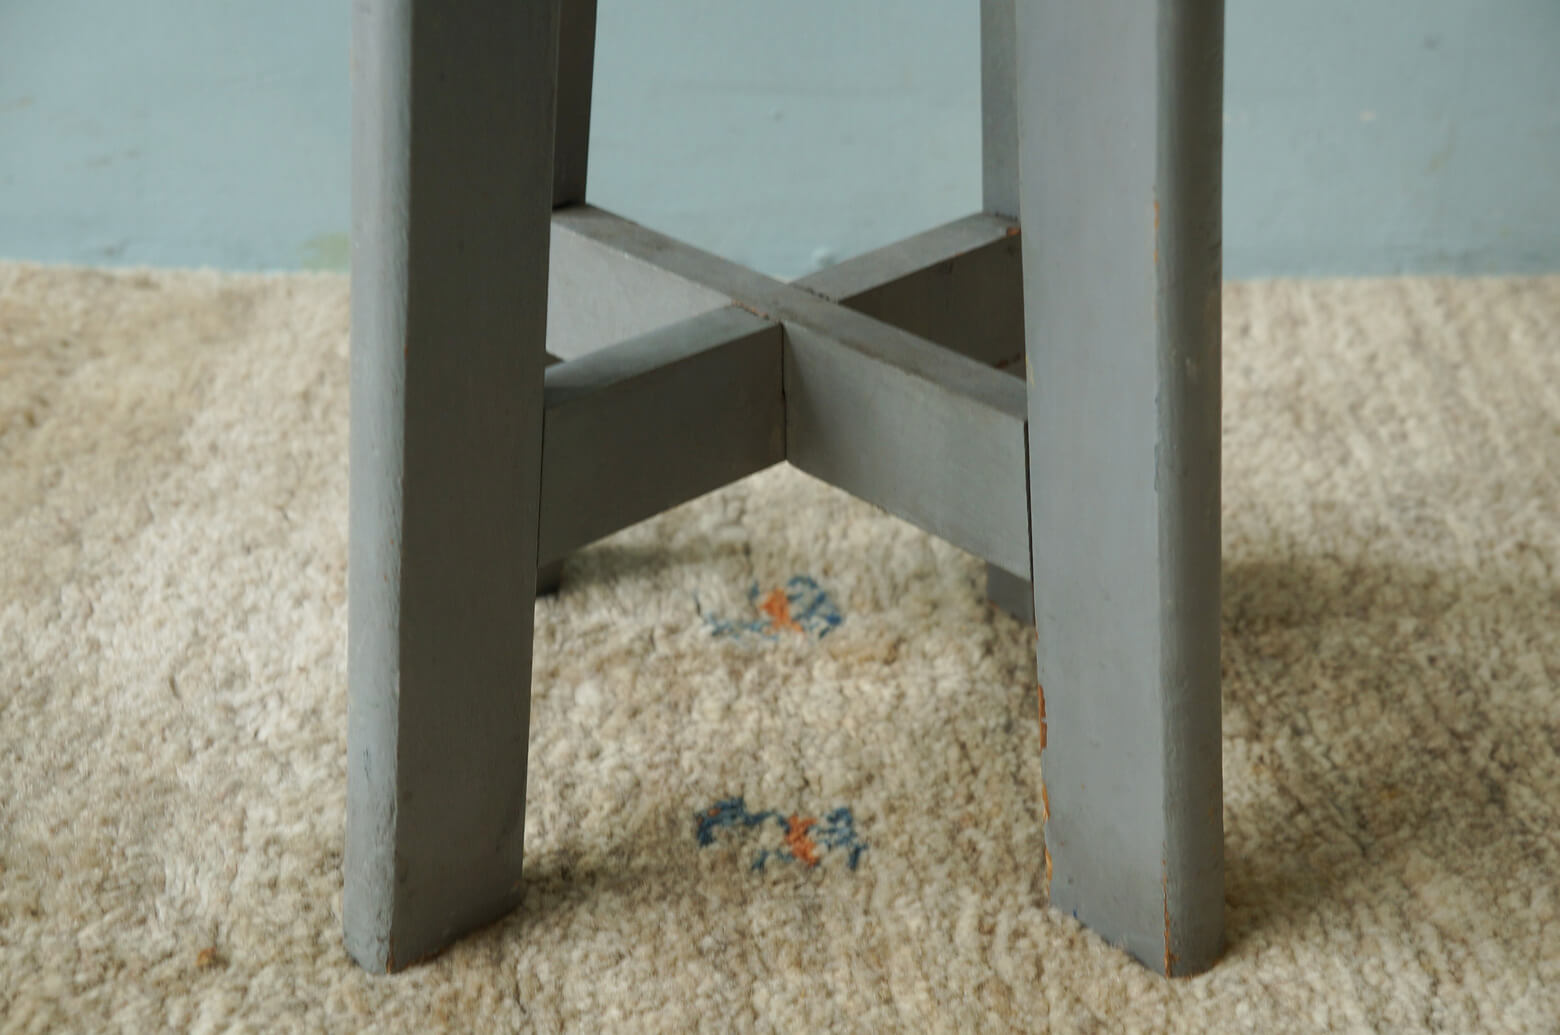 Vintage Round Atelier Stool Painted Gray/ヴィンテージ ラウンドアトリエスツール 丸椅子 グレーペイント シャビーシック 3